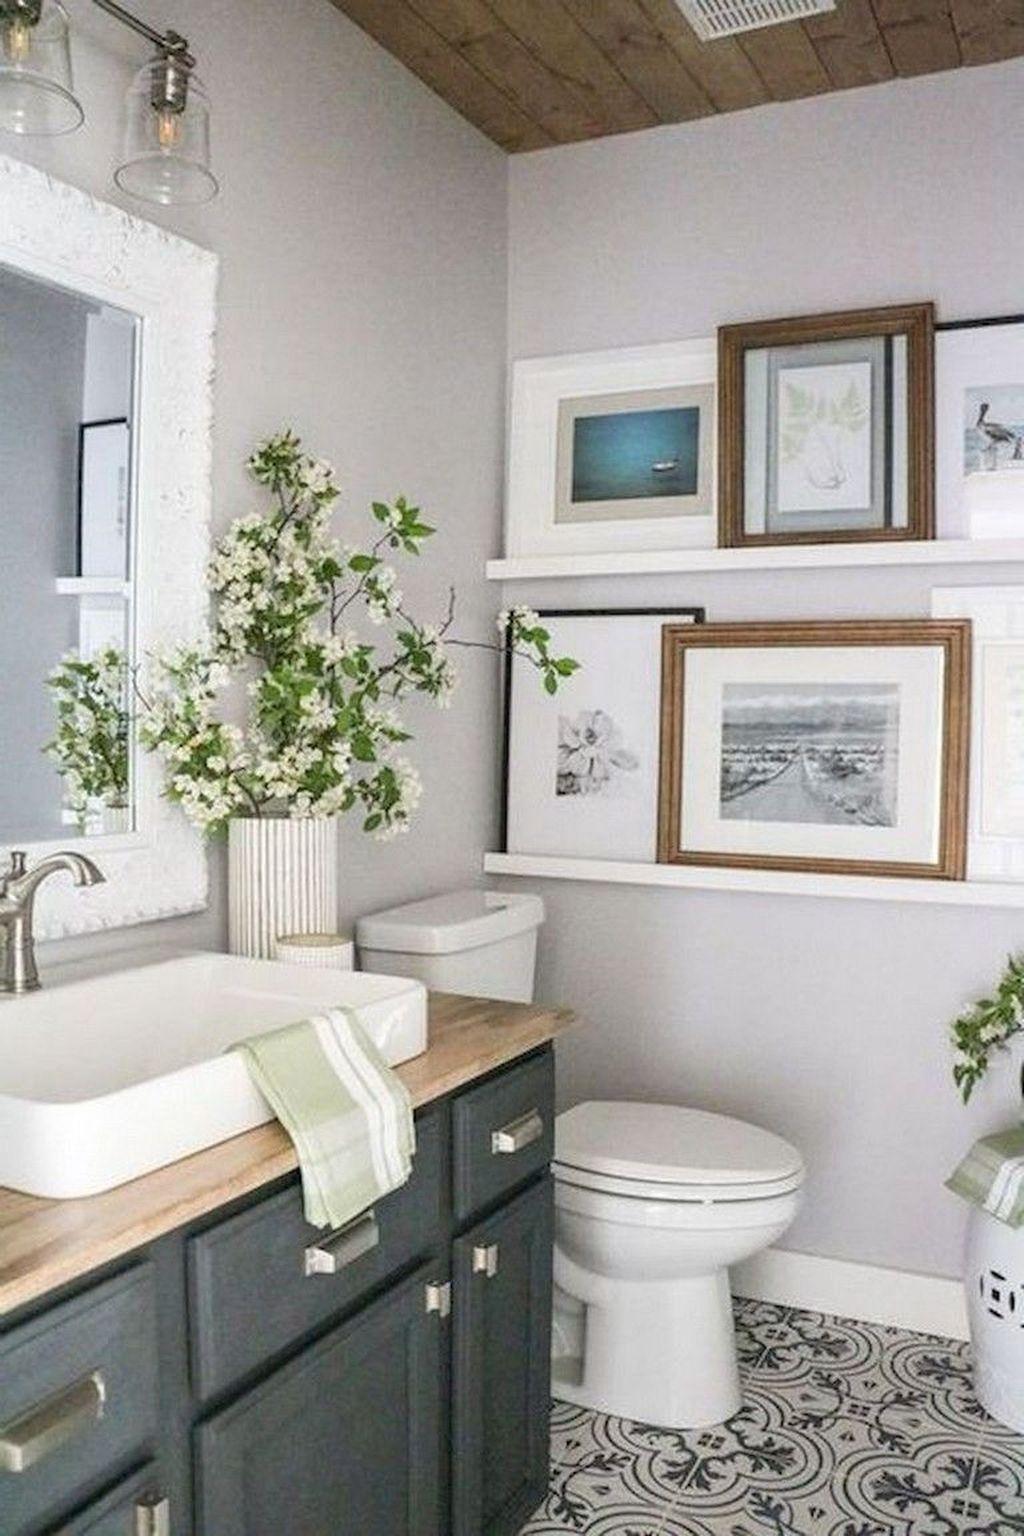 46 Gorgeous Farmhouse Bathroom Ideas With Rustic Designs ...